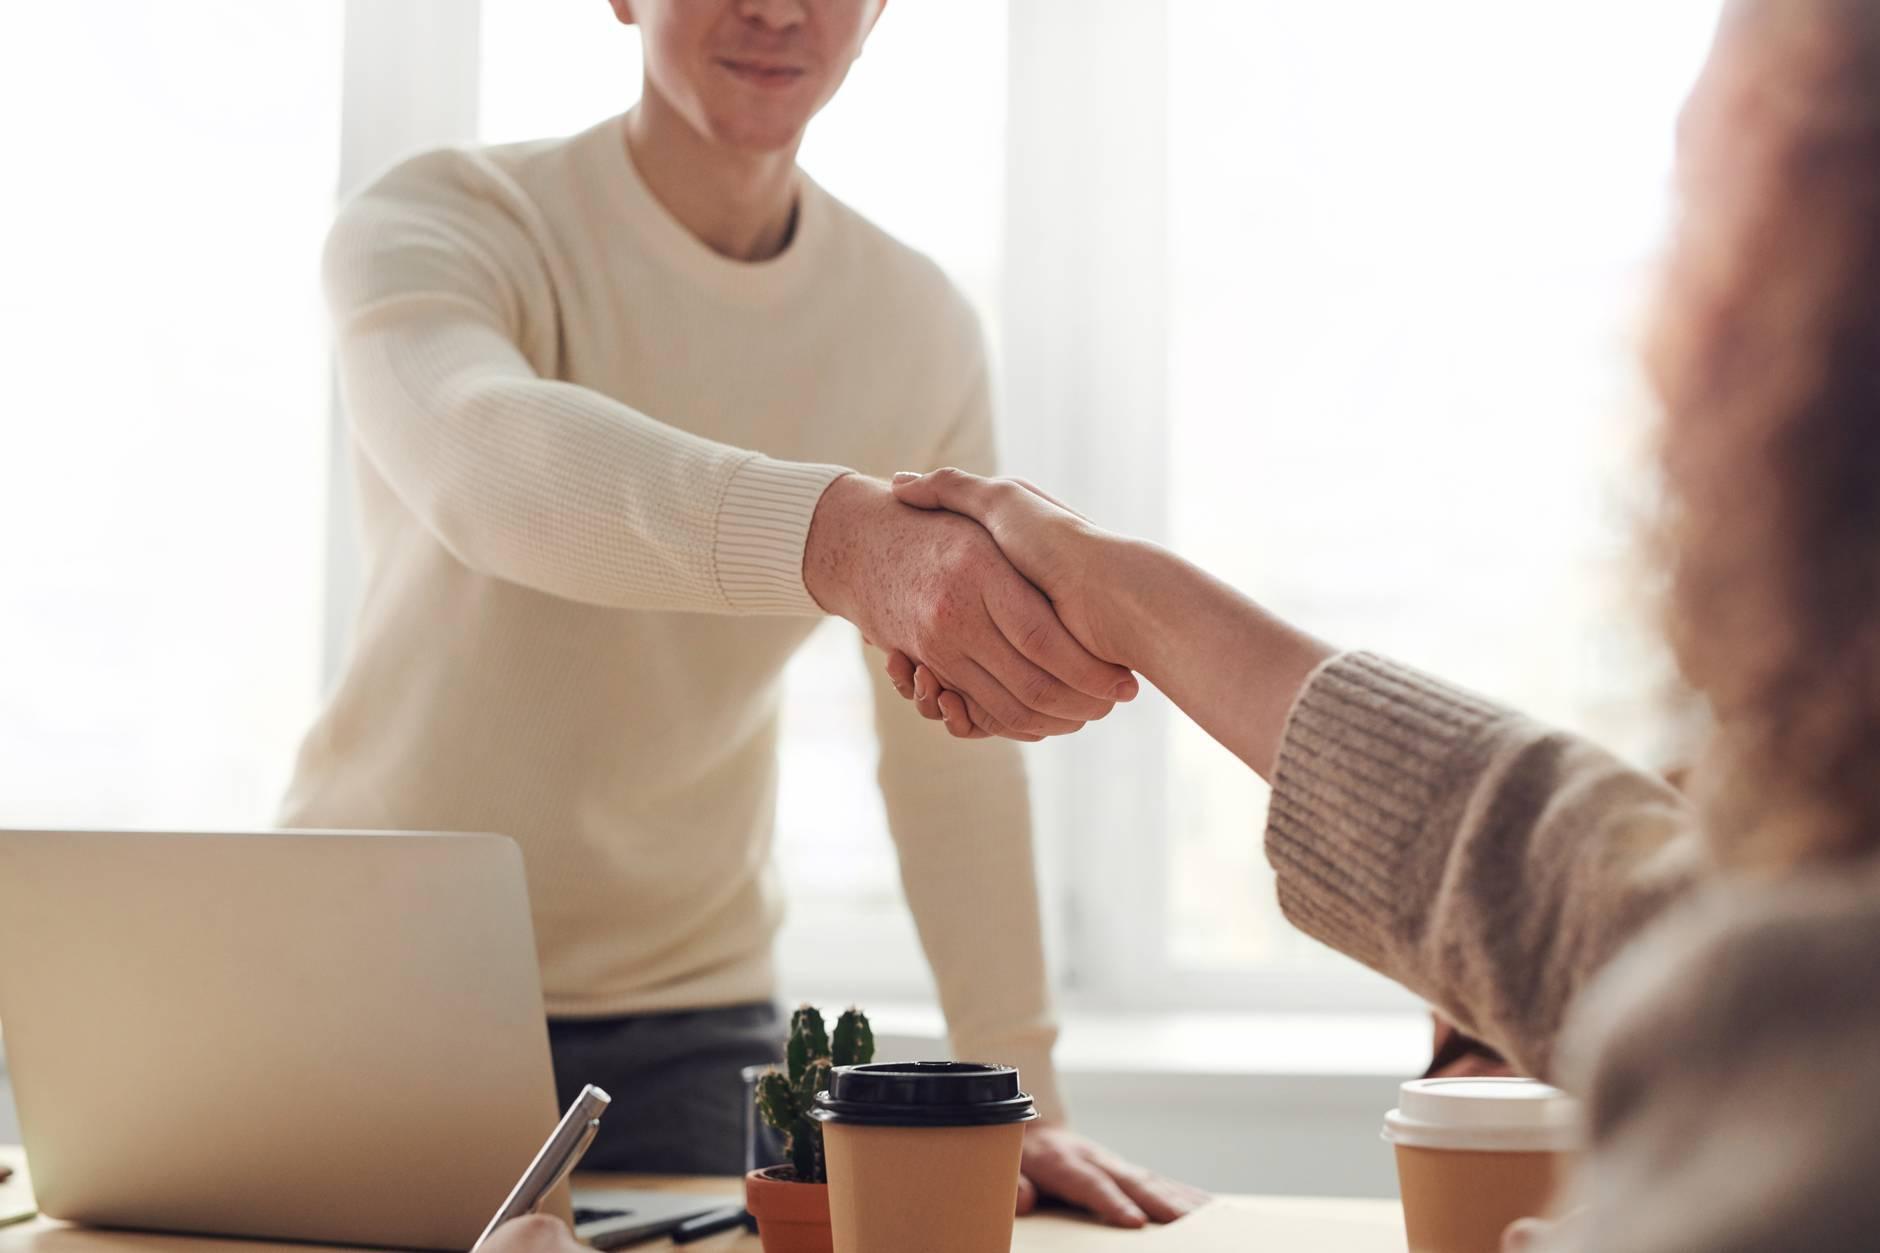 shake hands for orange and bergamot